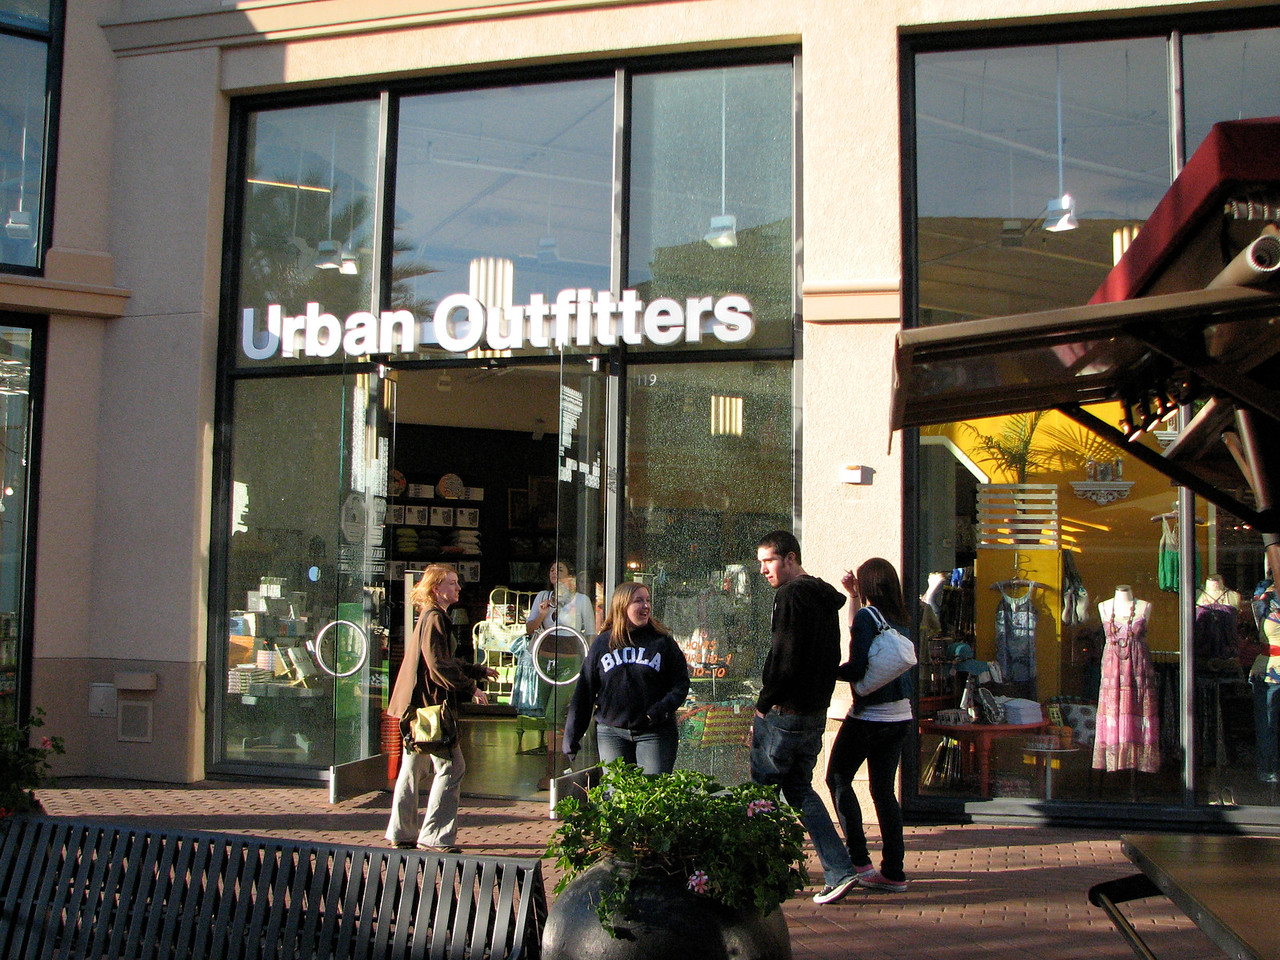 2007 03 02 Fri - Scavenger Hunt - Urban Outfitters